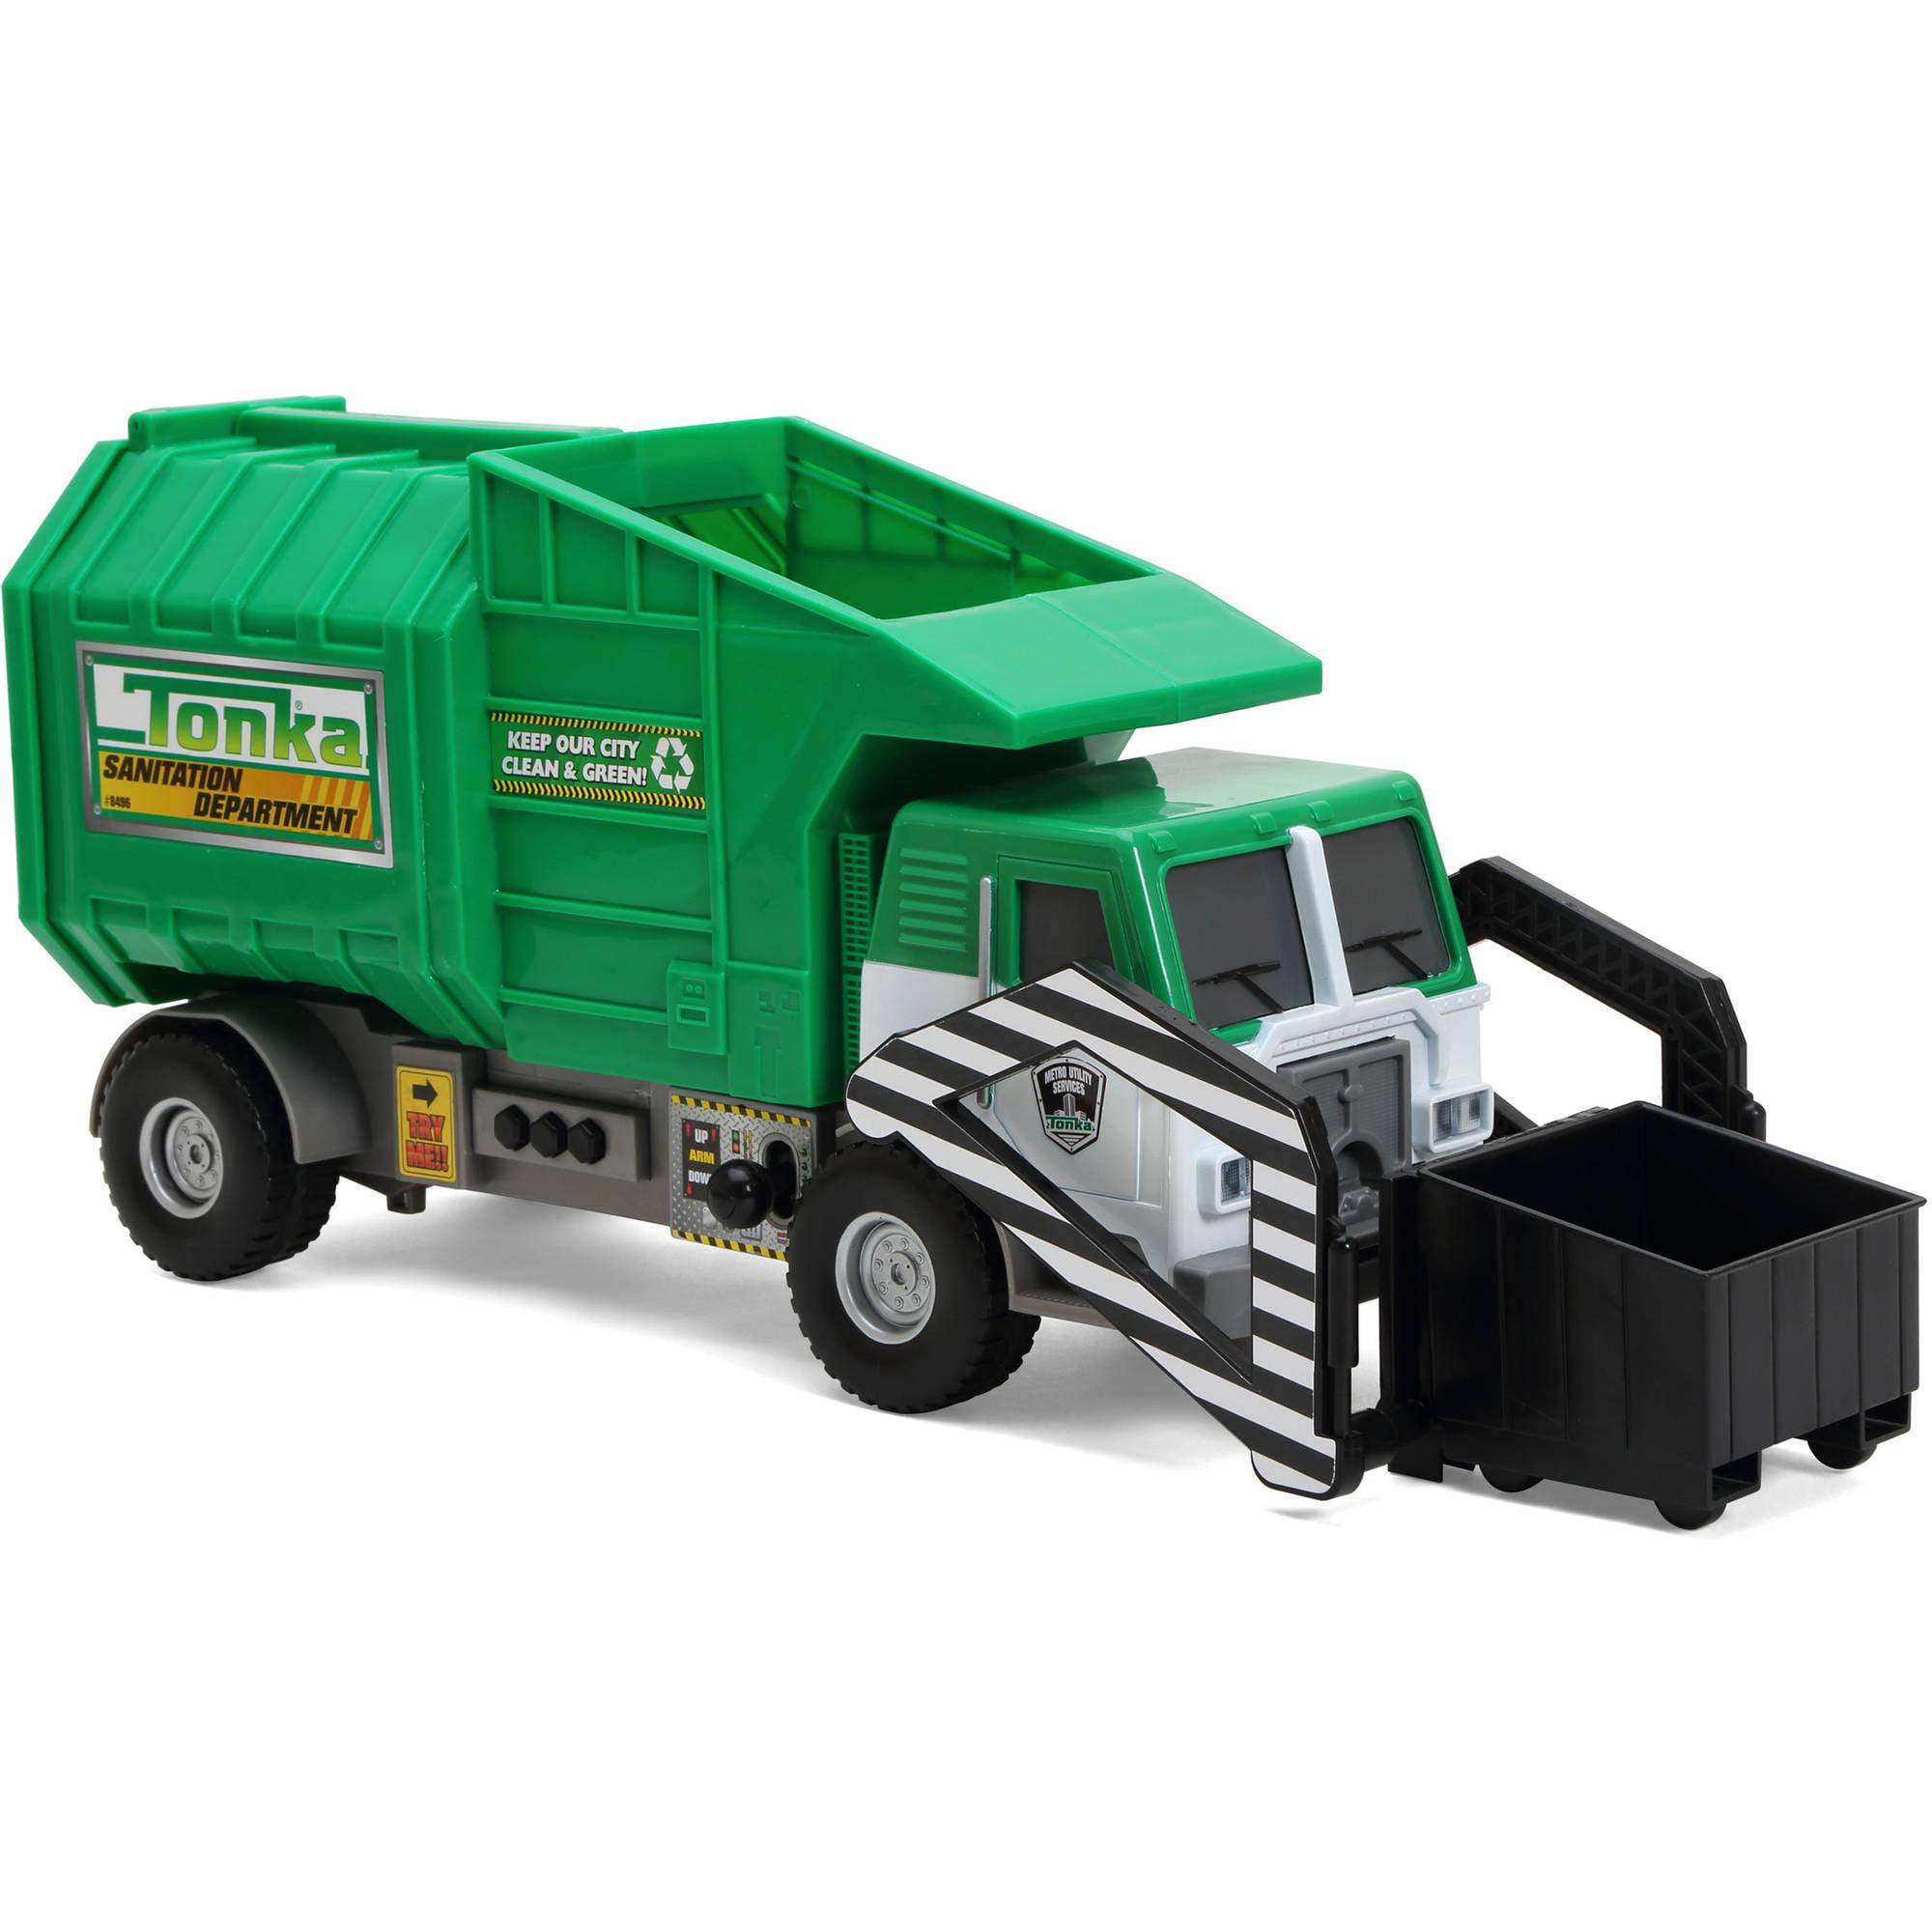 Funrise Toy Tonka Mighty Motorized Garbage Truck